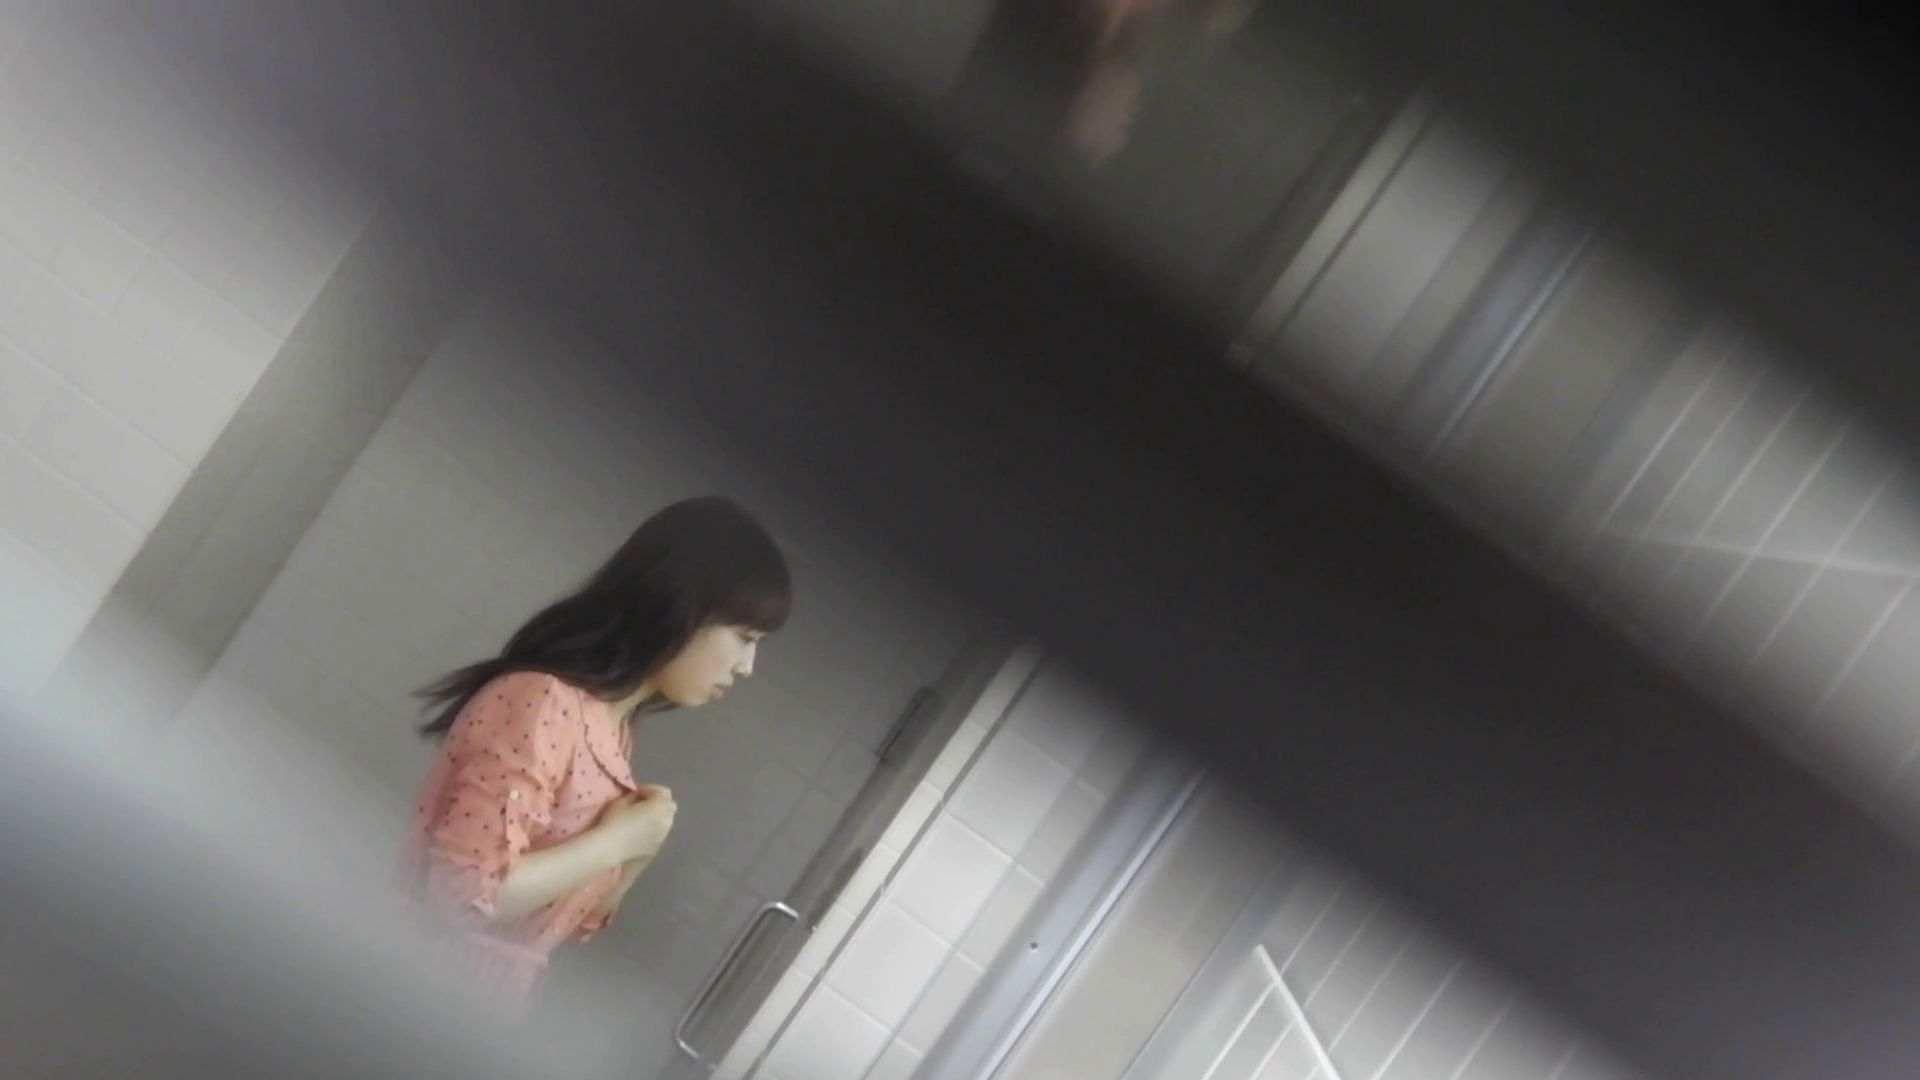 vol.27 命がけ潜伏洗面所! 小嶋陽菜似のピンクオシャレさん OL  87pic 20